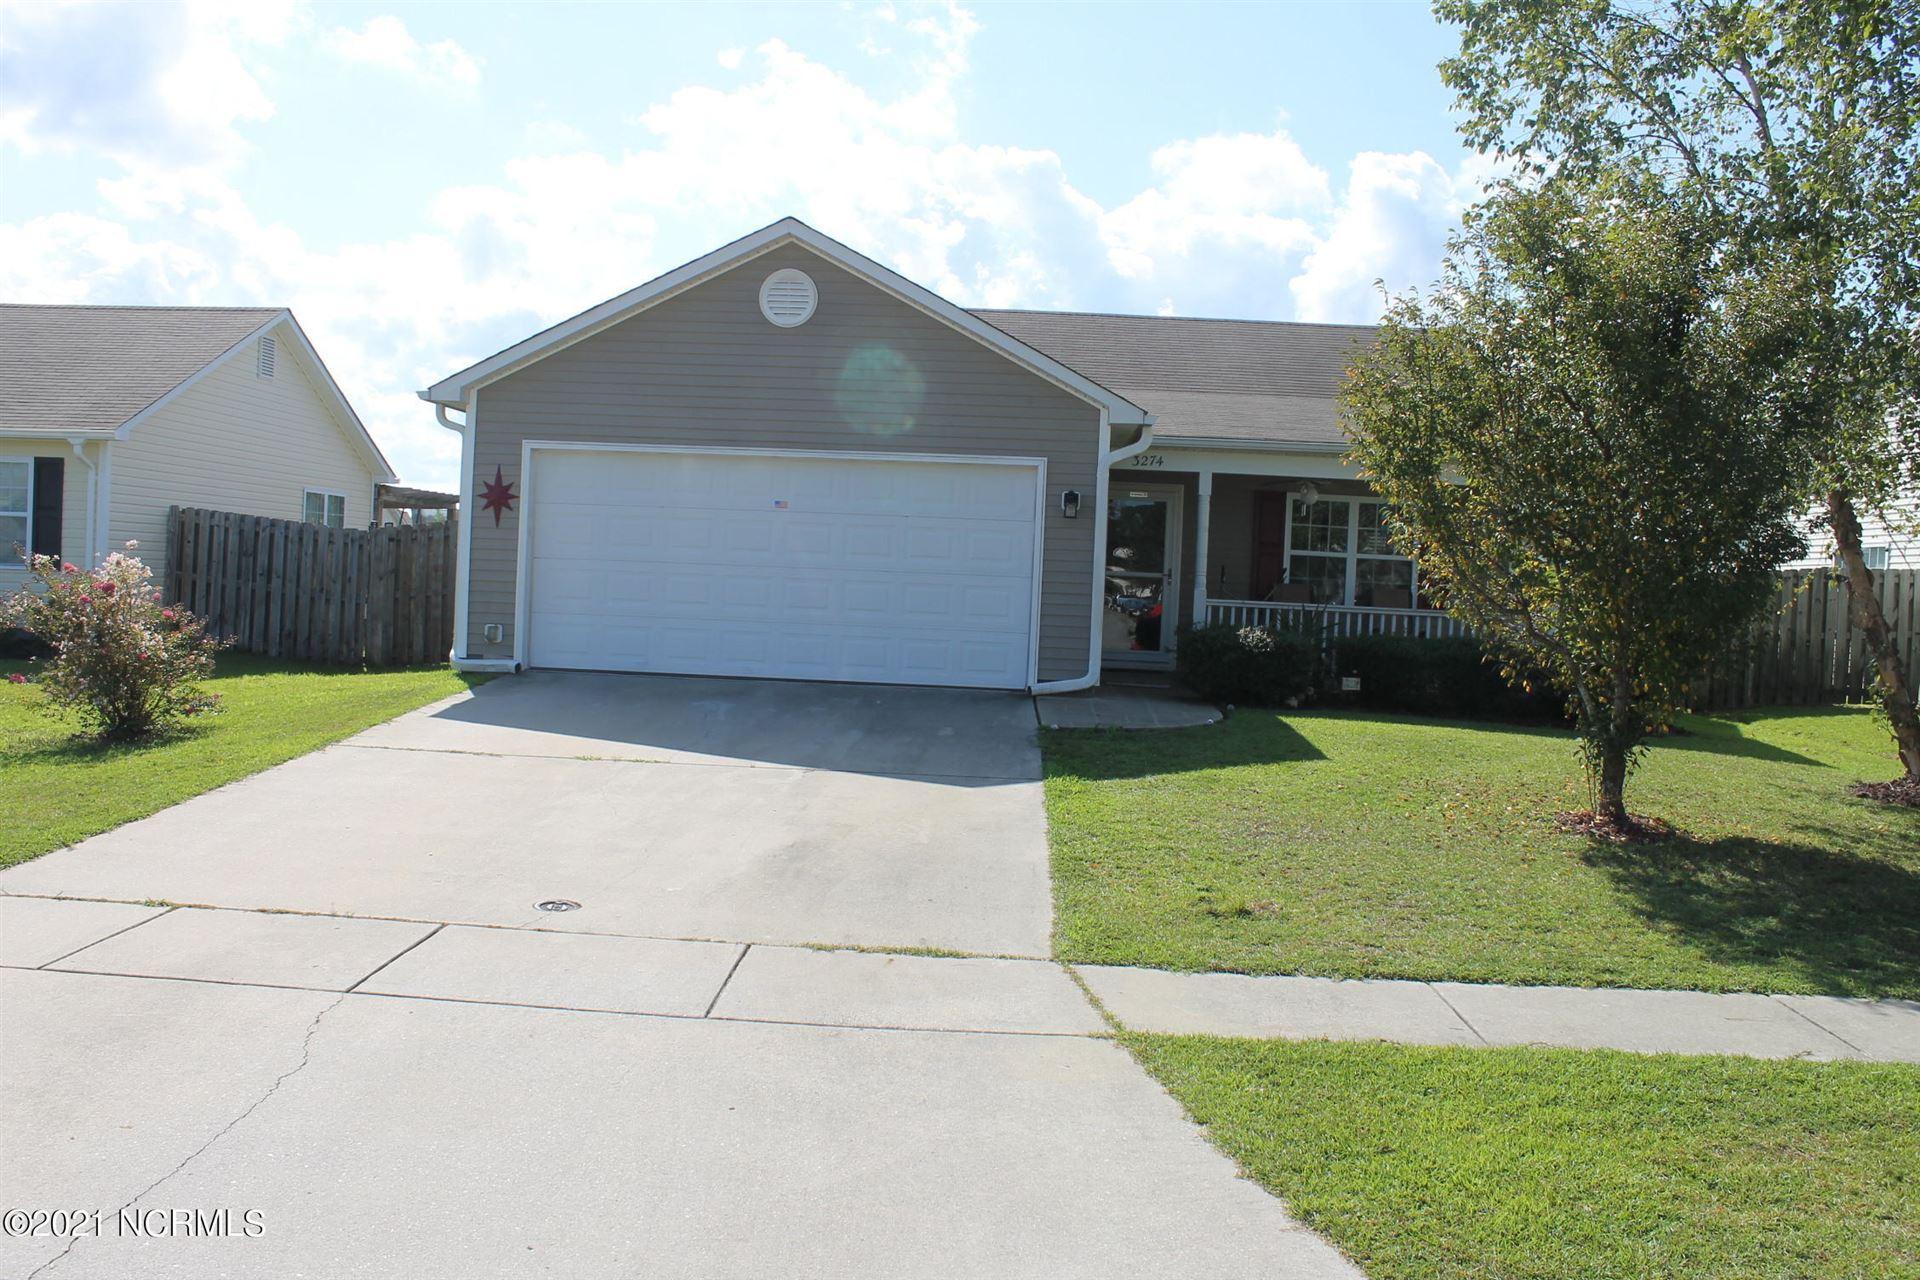 Photo for 3274 Greenridge Way, Leland, NC 28451 (MLS # 100282919)